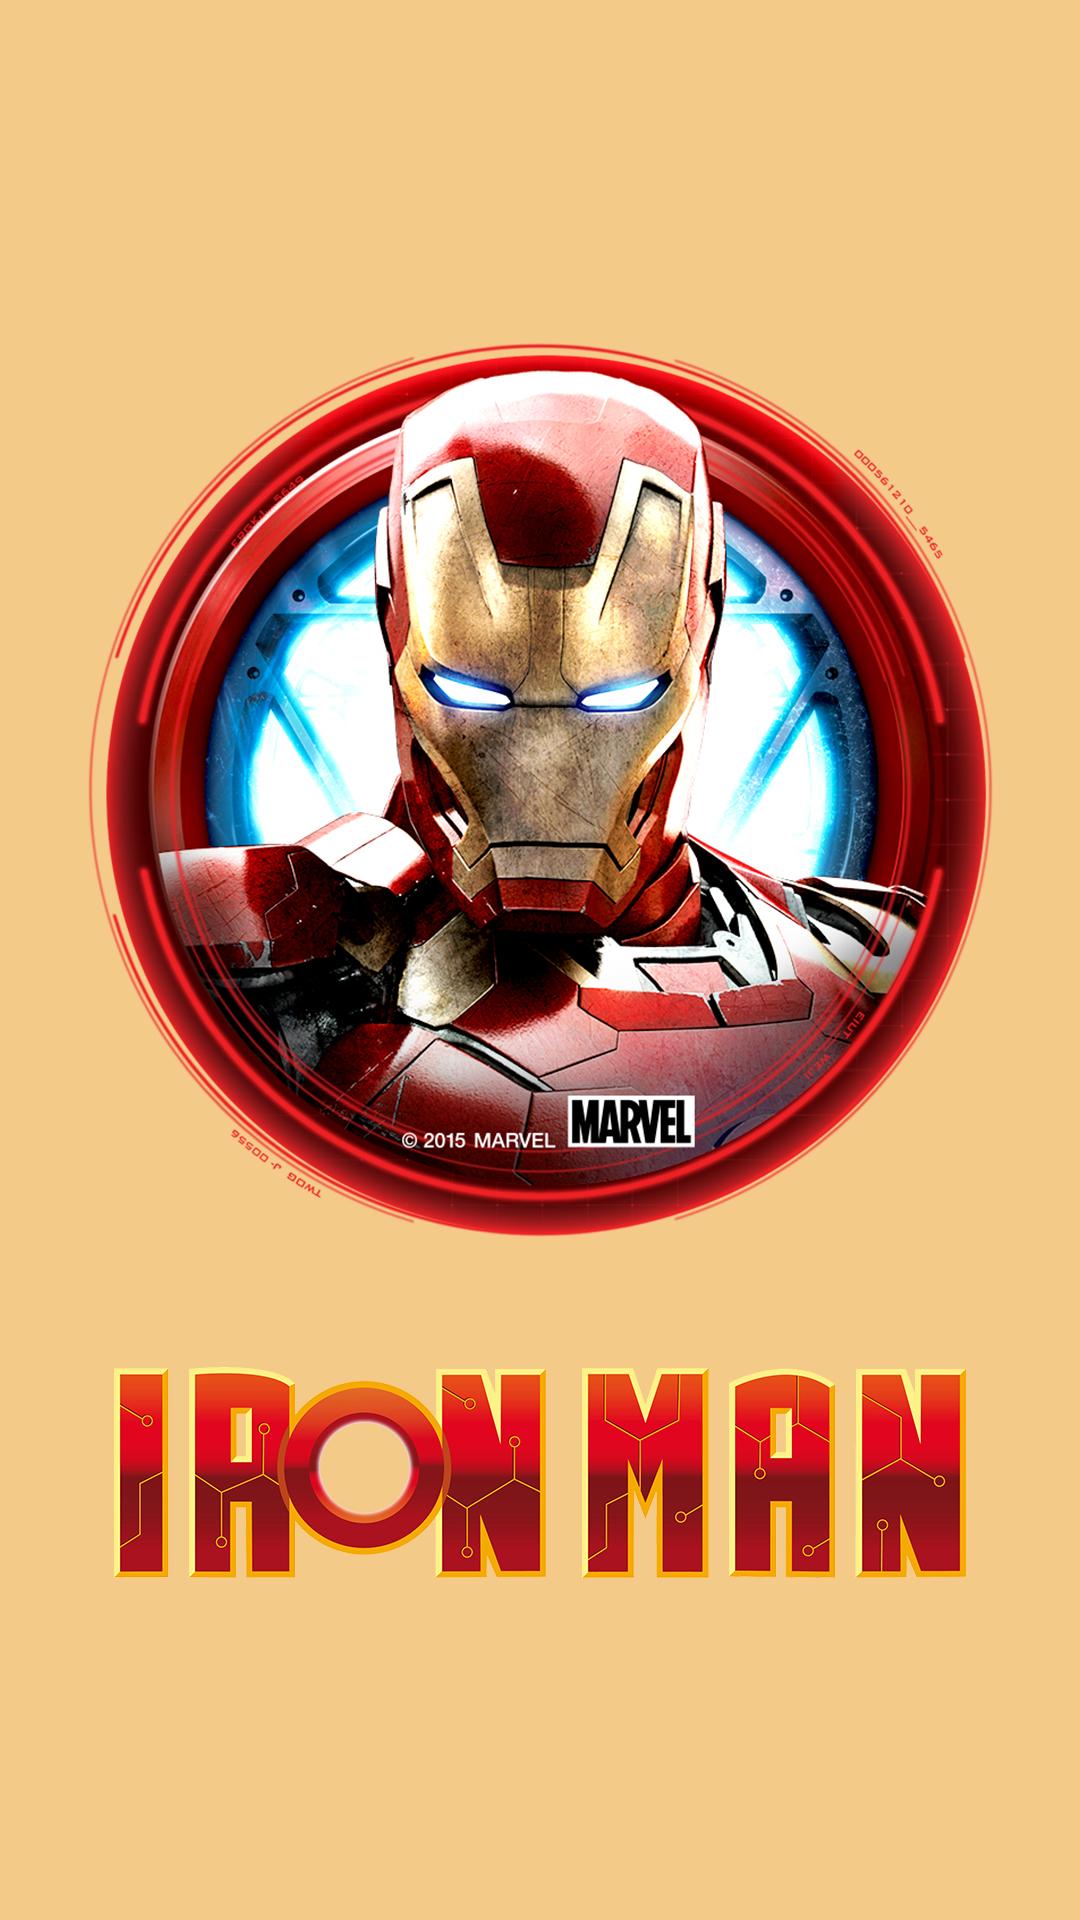 Iron Man Download Mobile Phone Full Hd Wallpaper